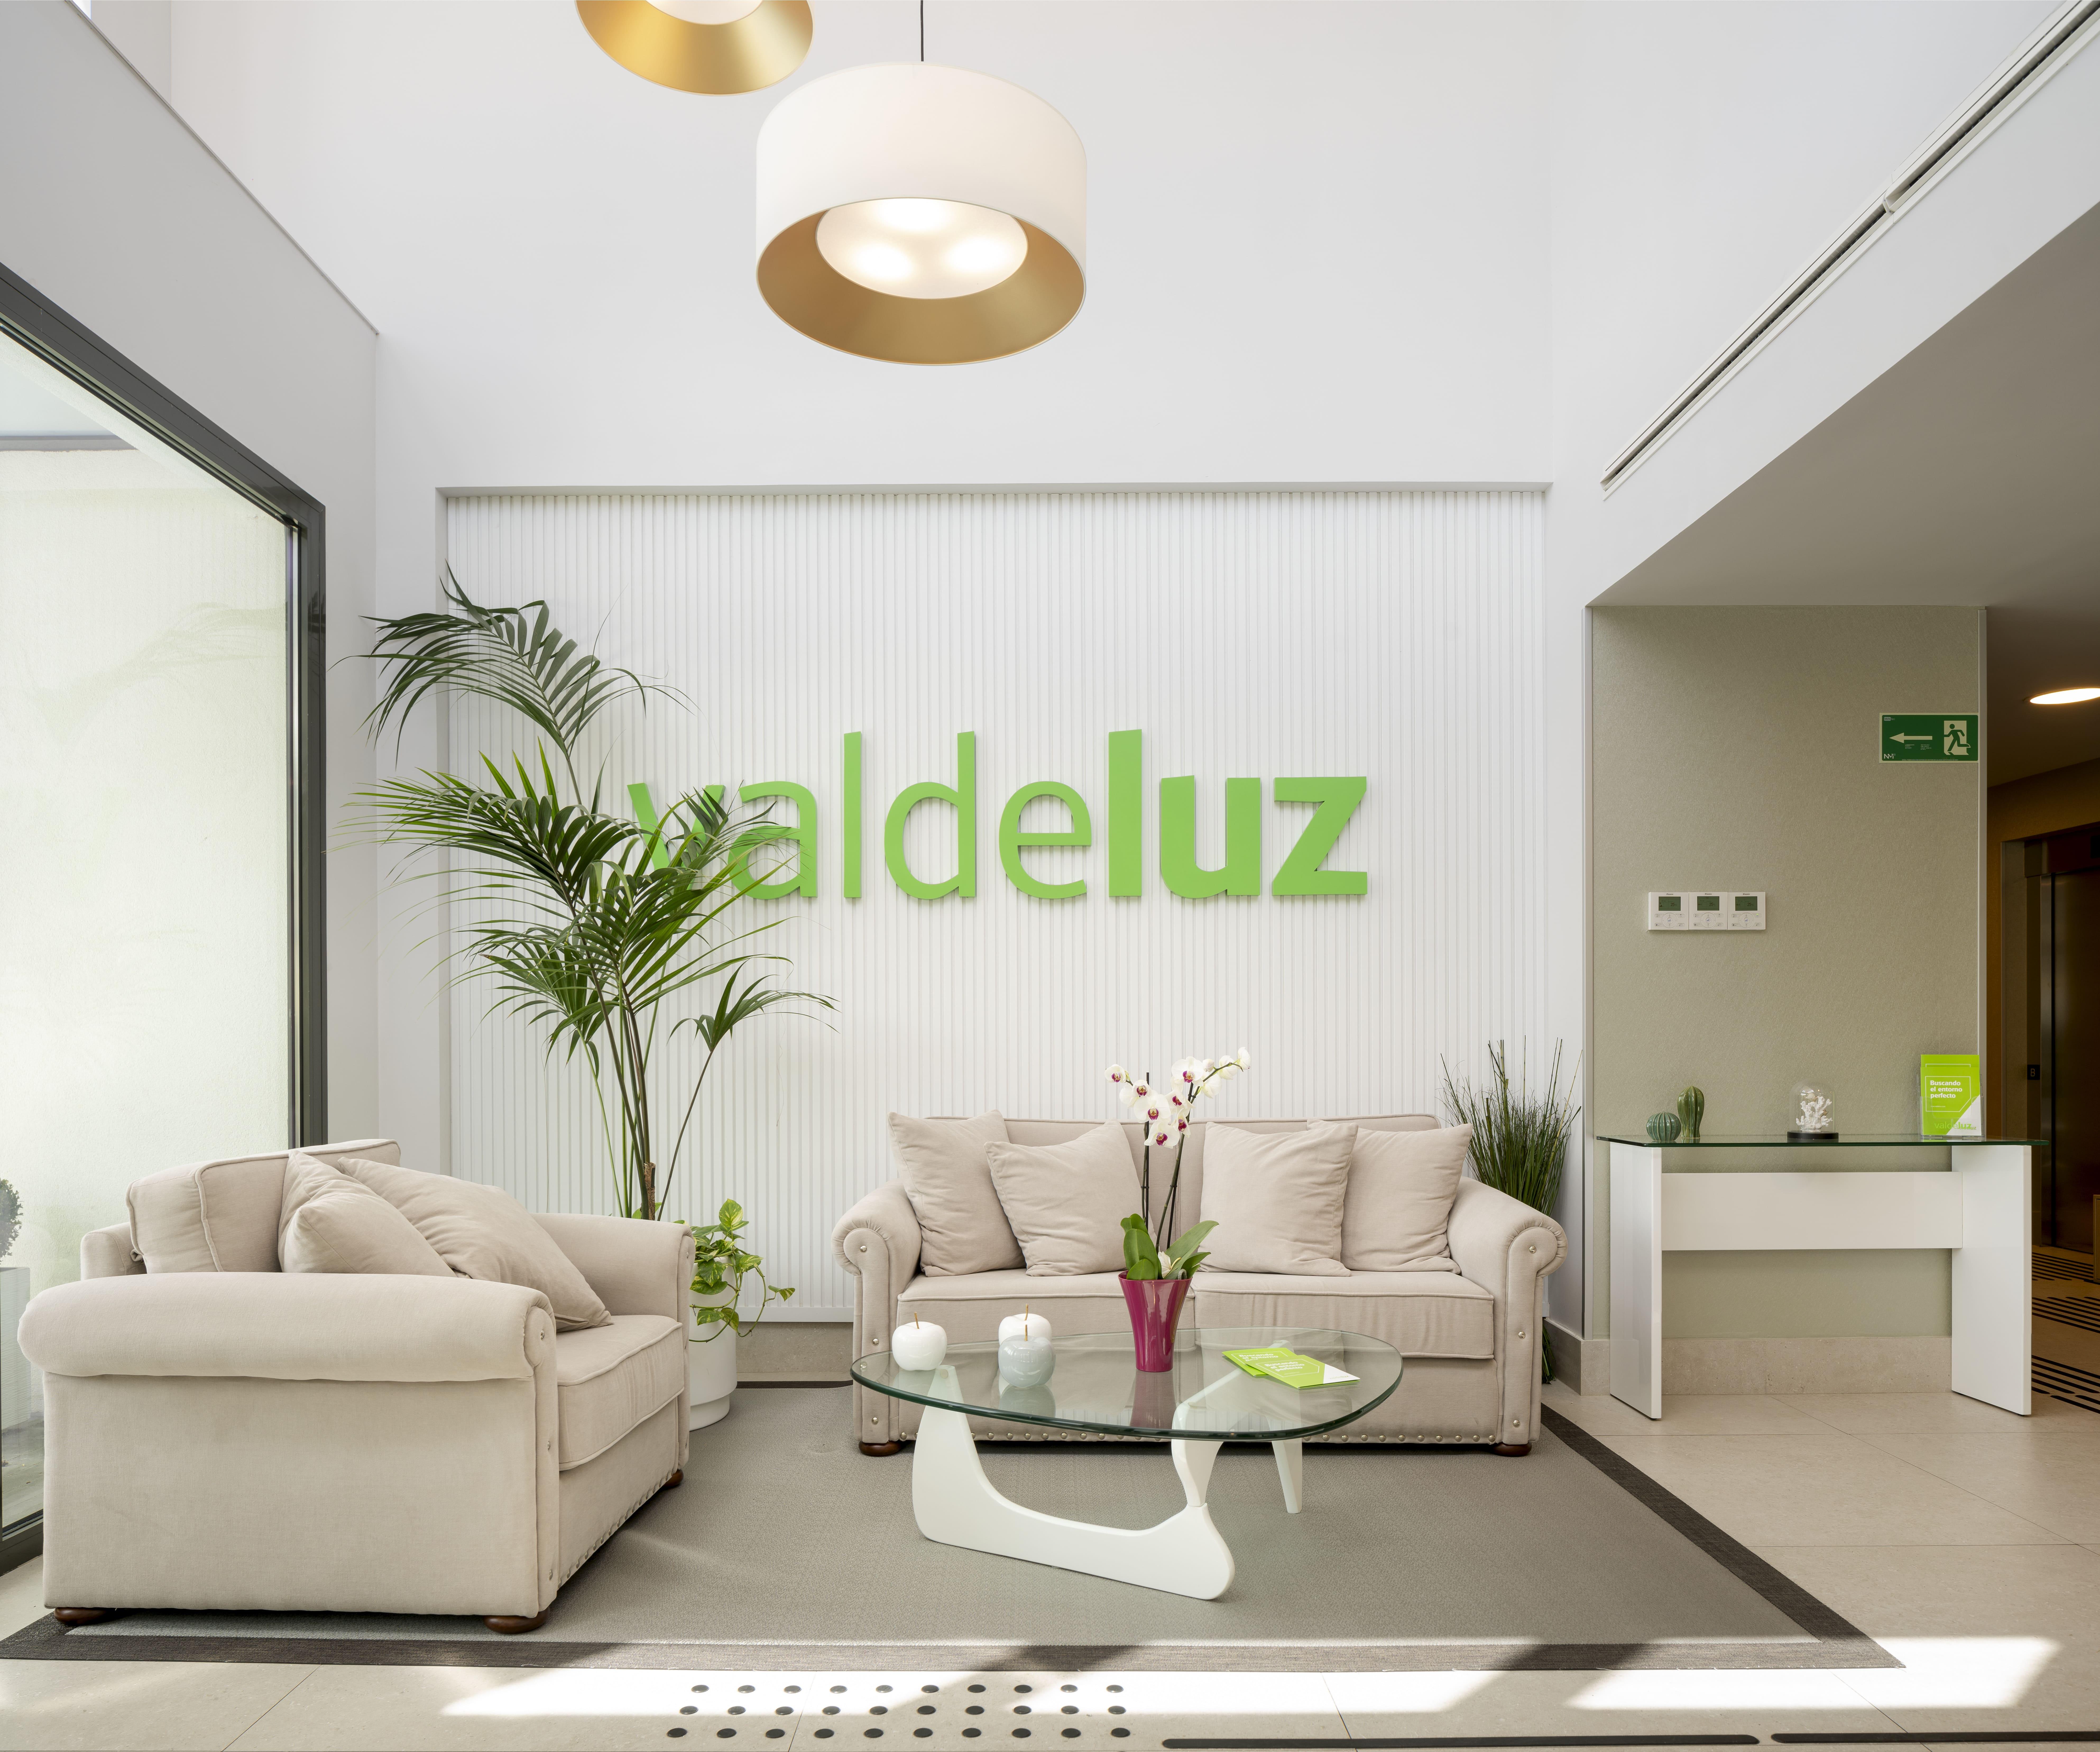 VALDELUZ_003_-_Sandra_Lopez